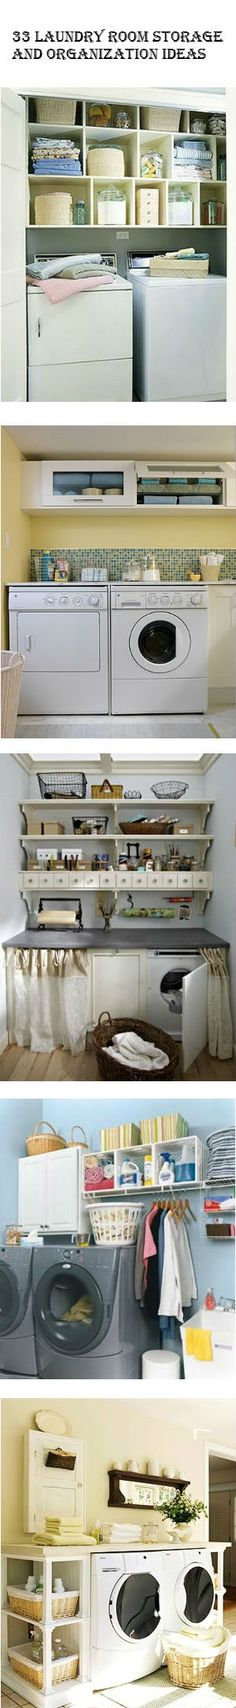 33 Laundry Room Storage and Organization Ideas   DIY Comfy Home by DIYNCraftz